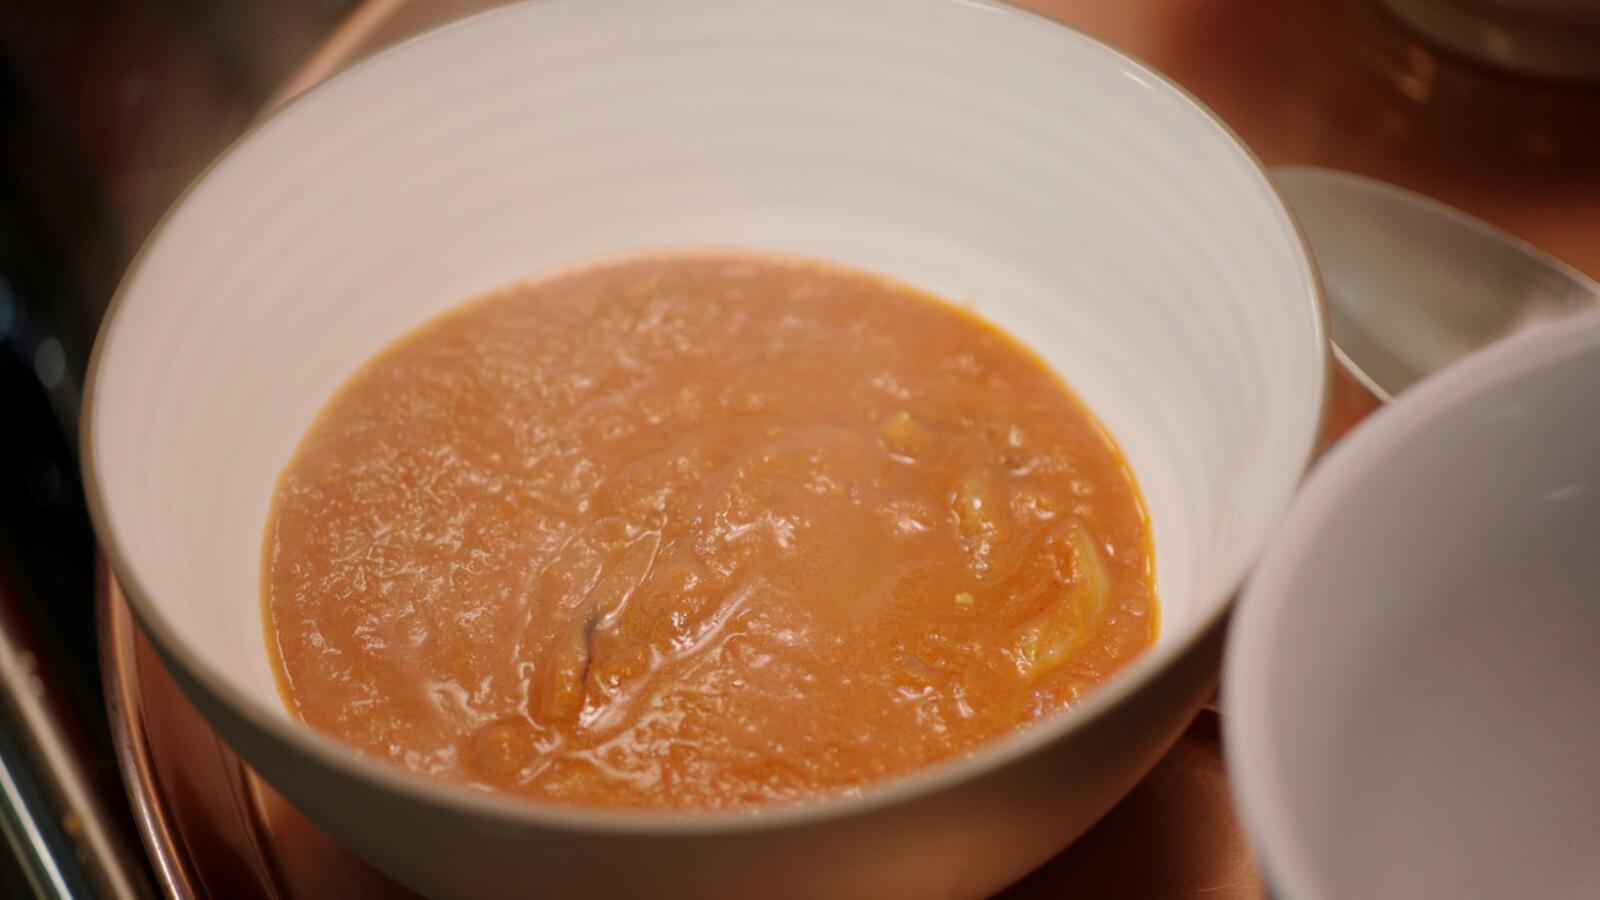 Uien- en tomatensoep met gebakken ui en spekjes